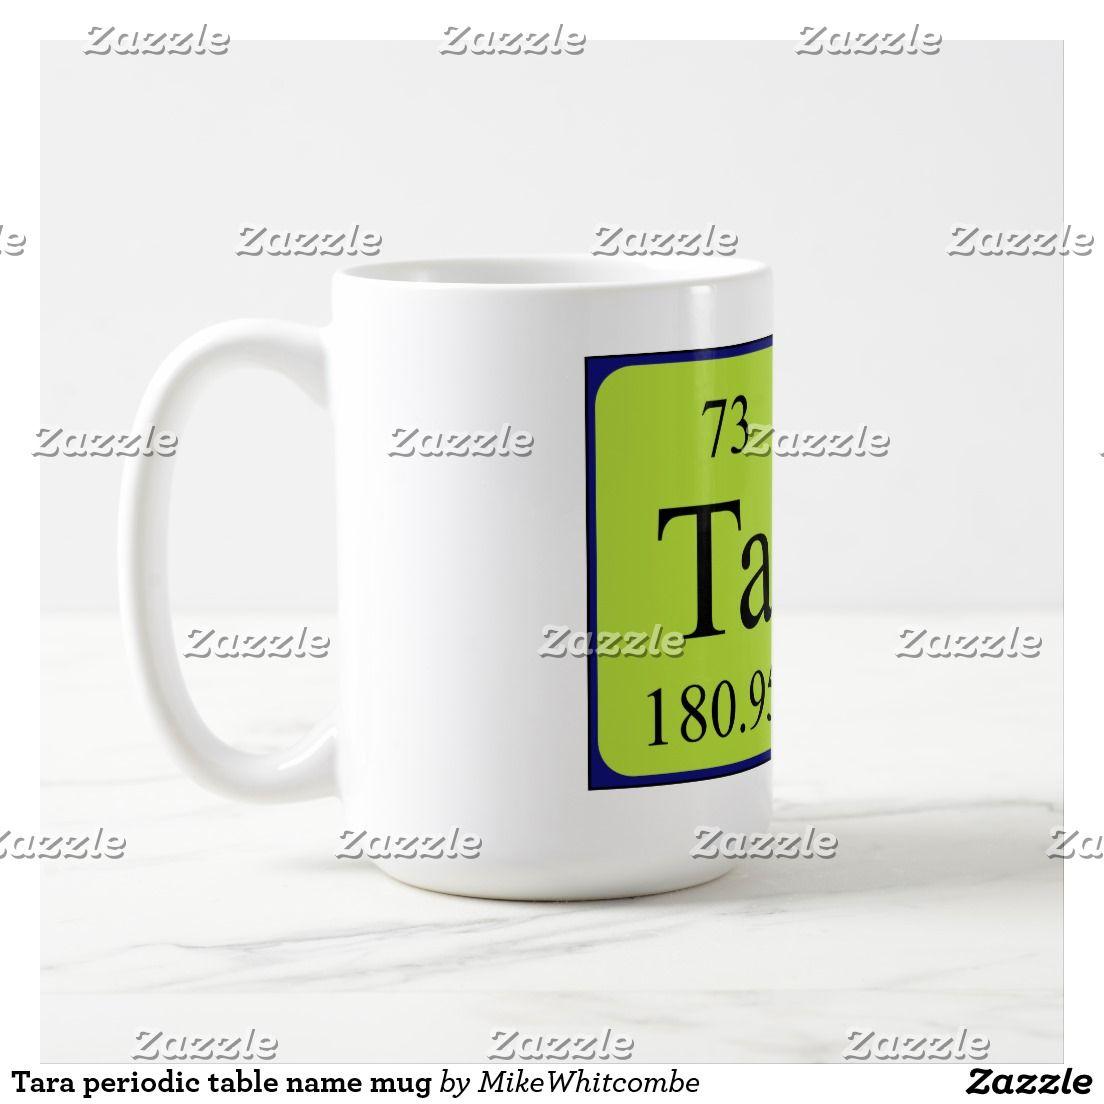 Tara periodic table name mug table names names and mugs tara periodic table name mug urtaz Image collections